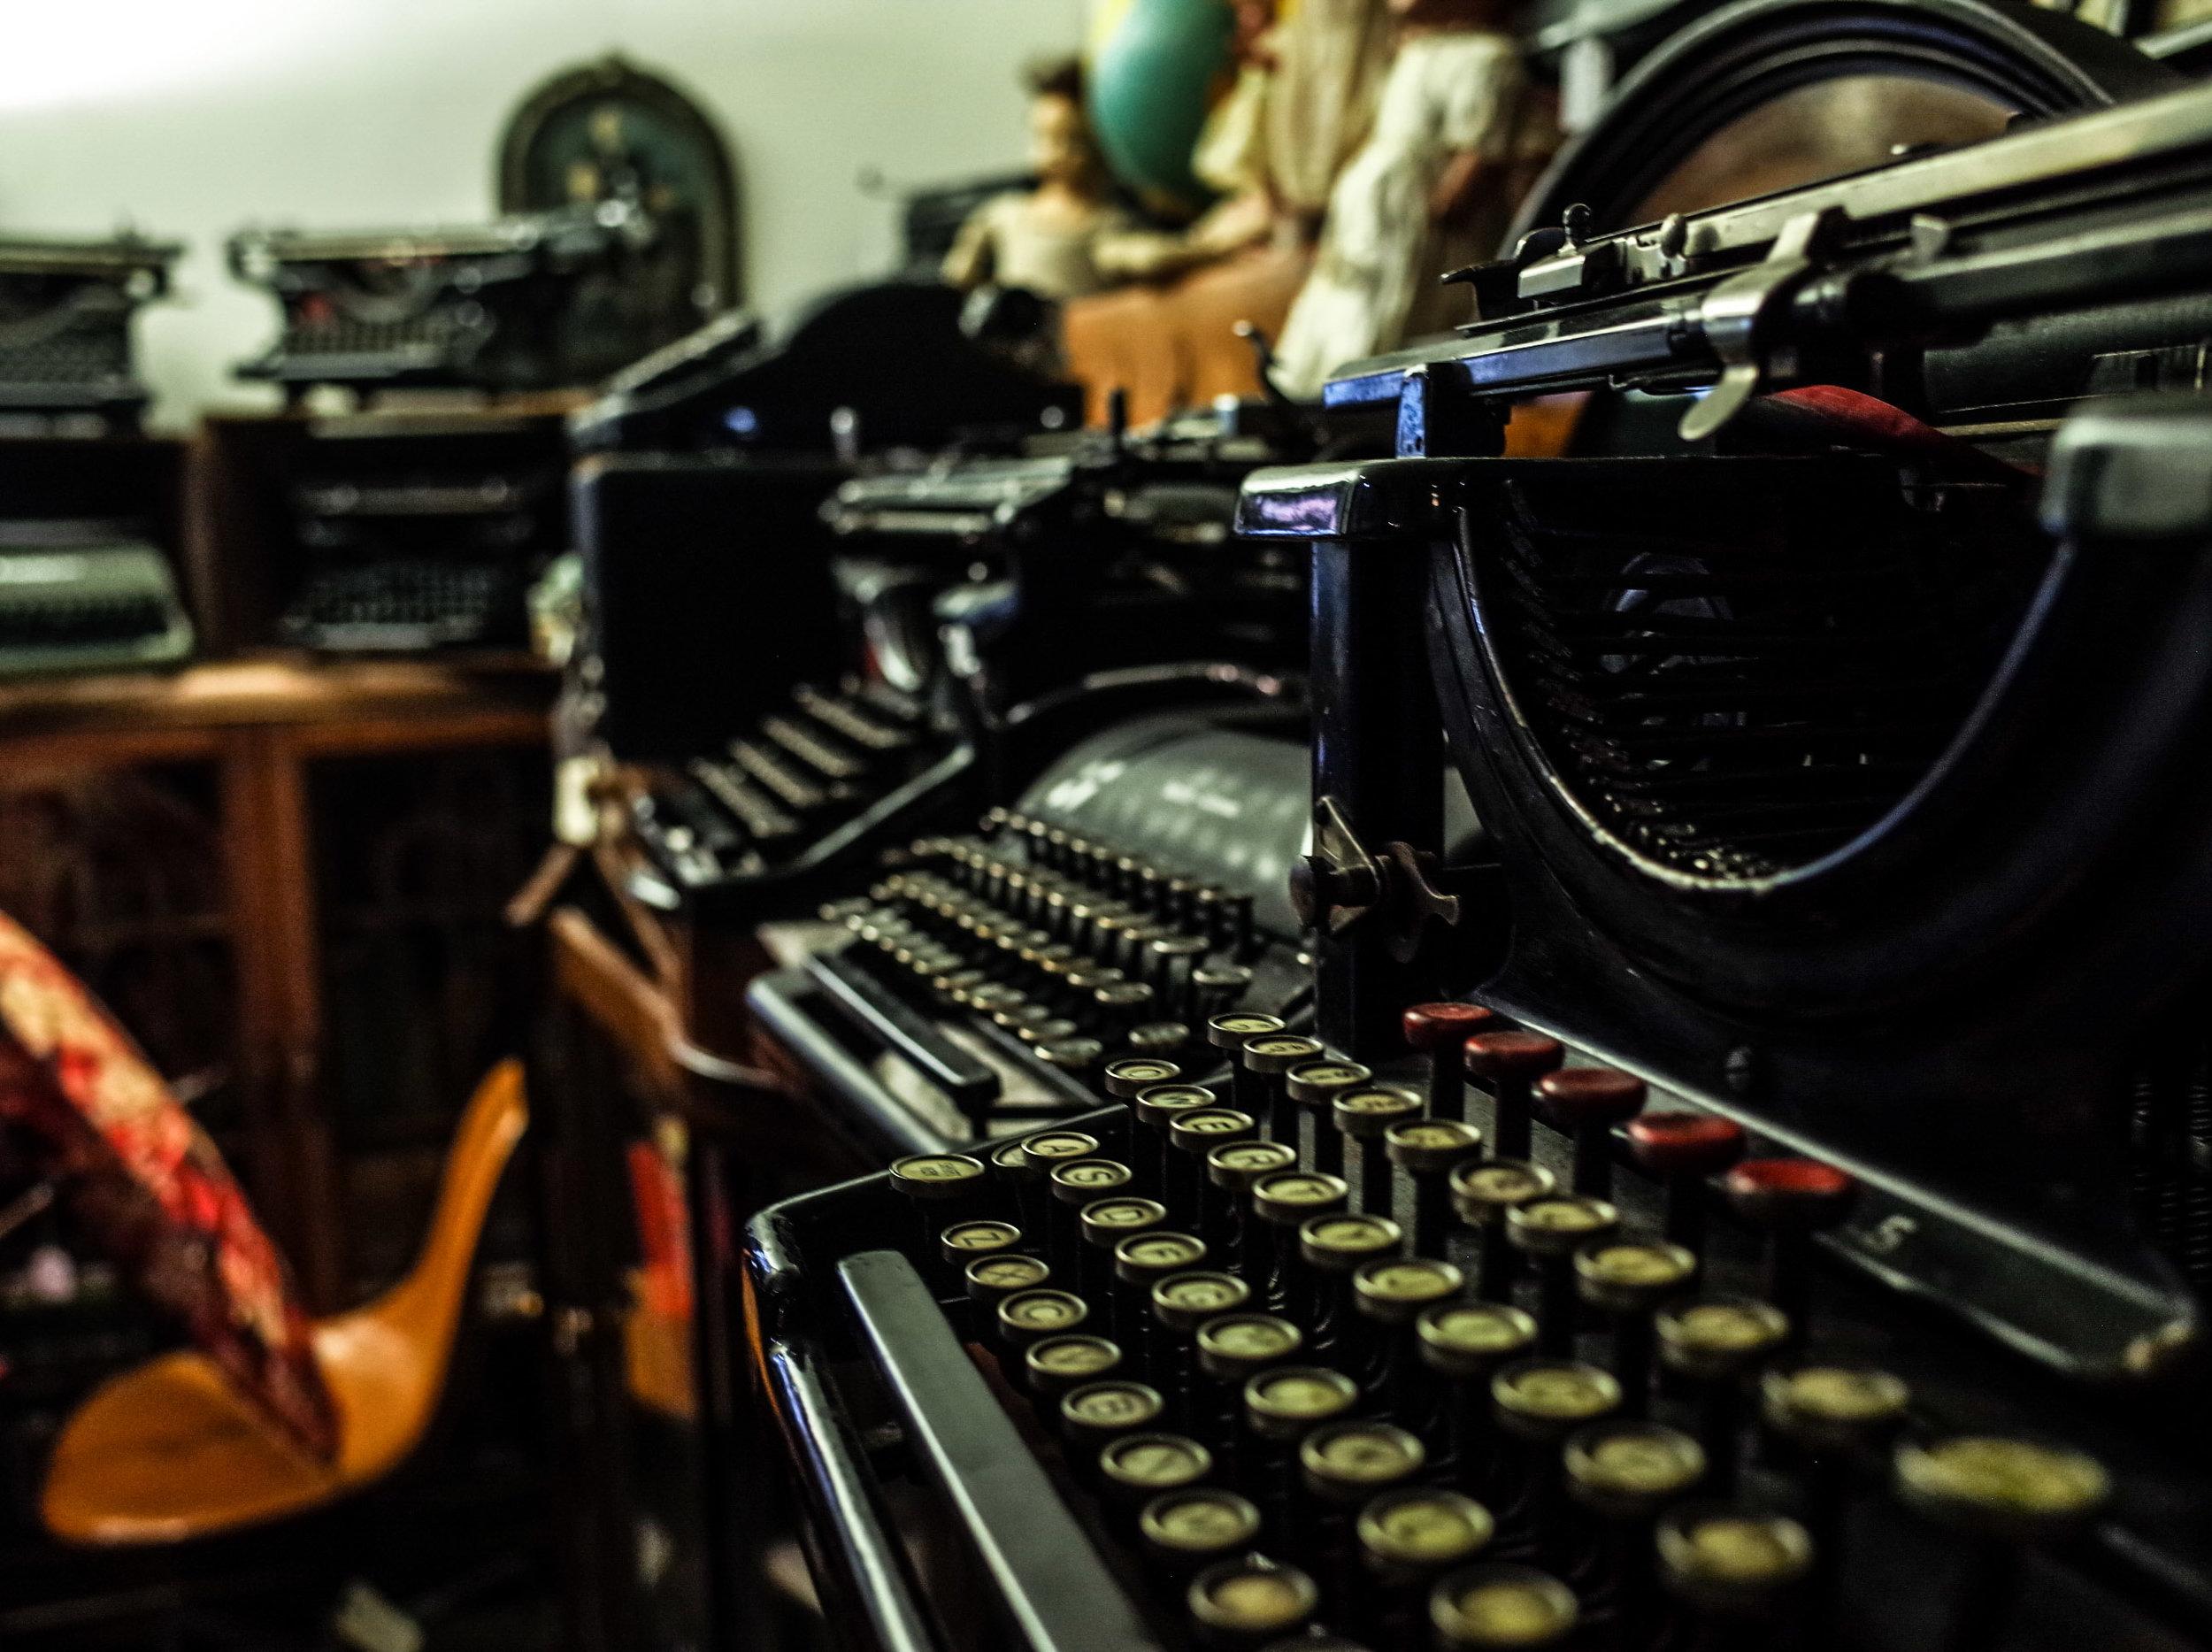 typewriter-for-sale-vancouver.jpg